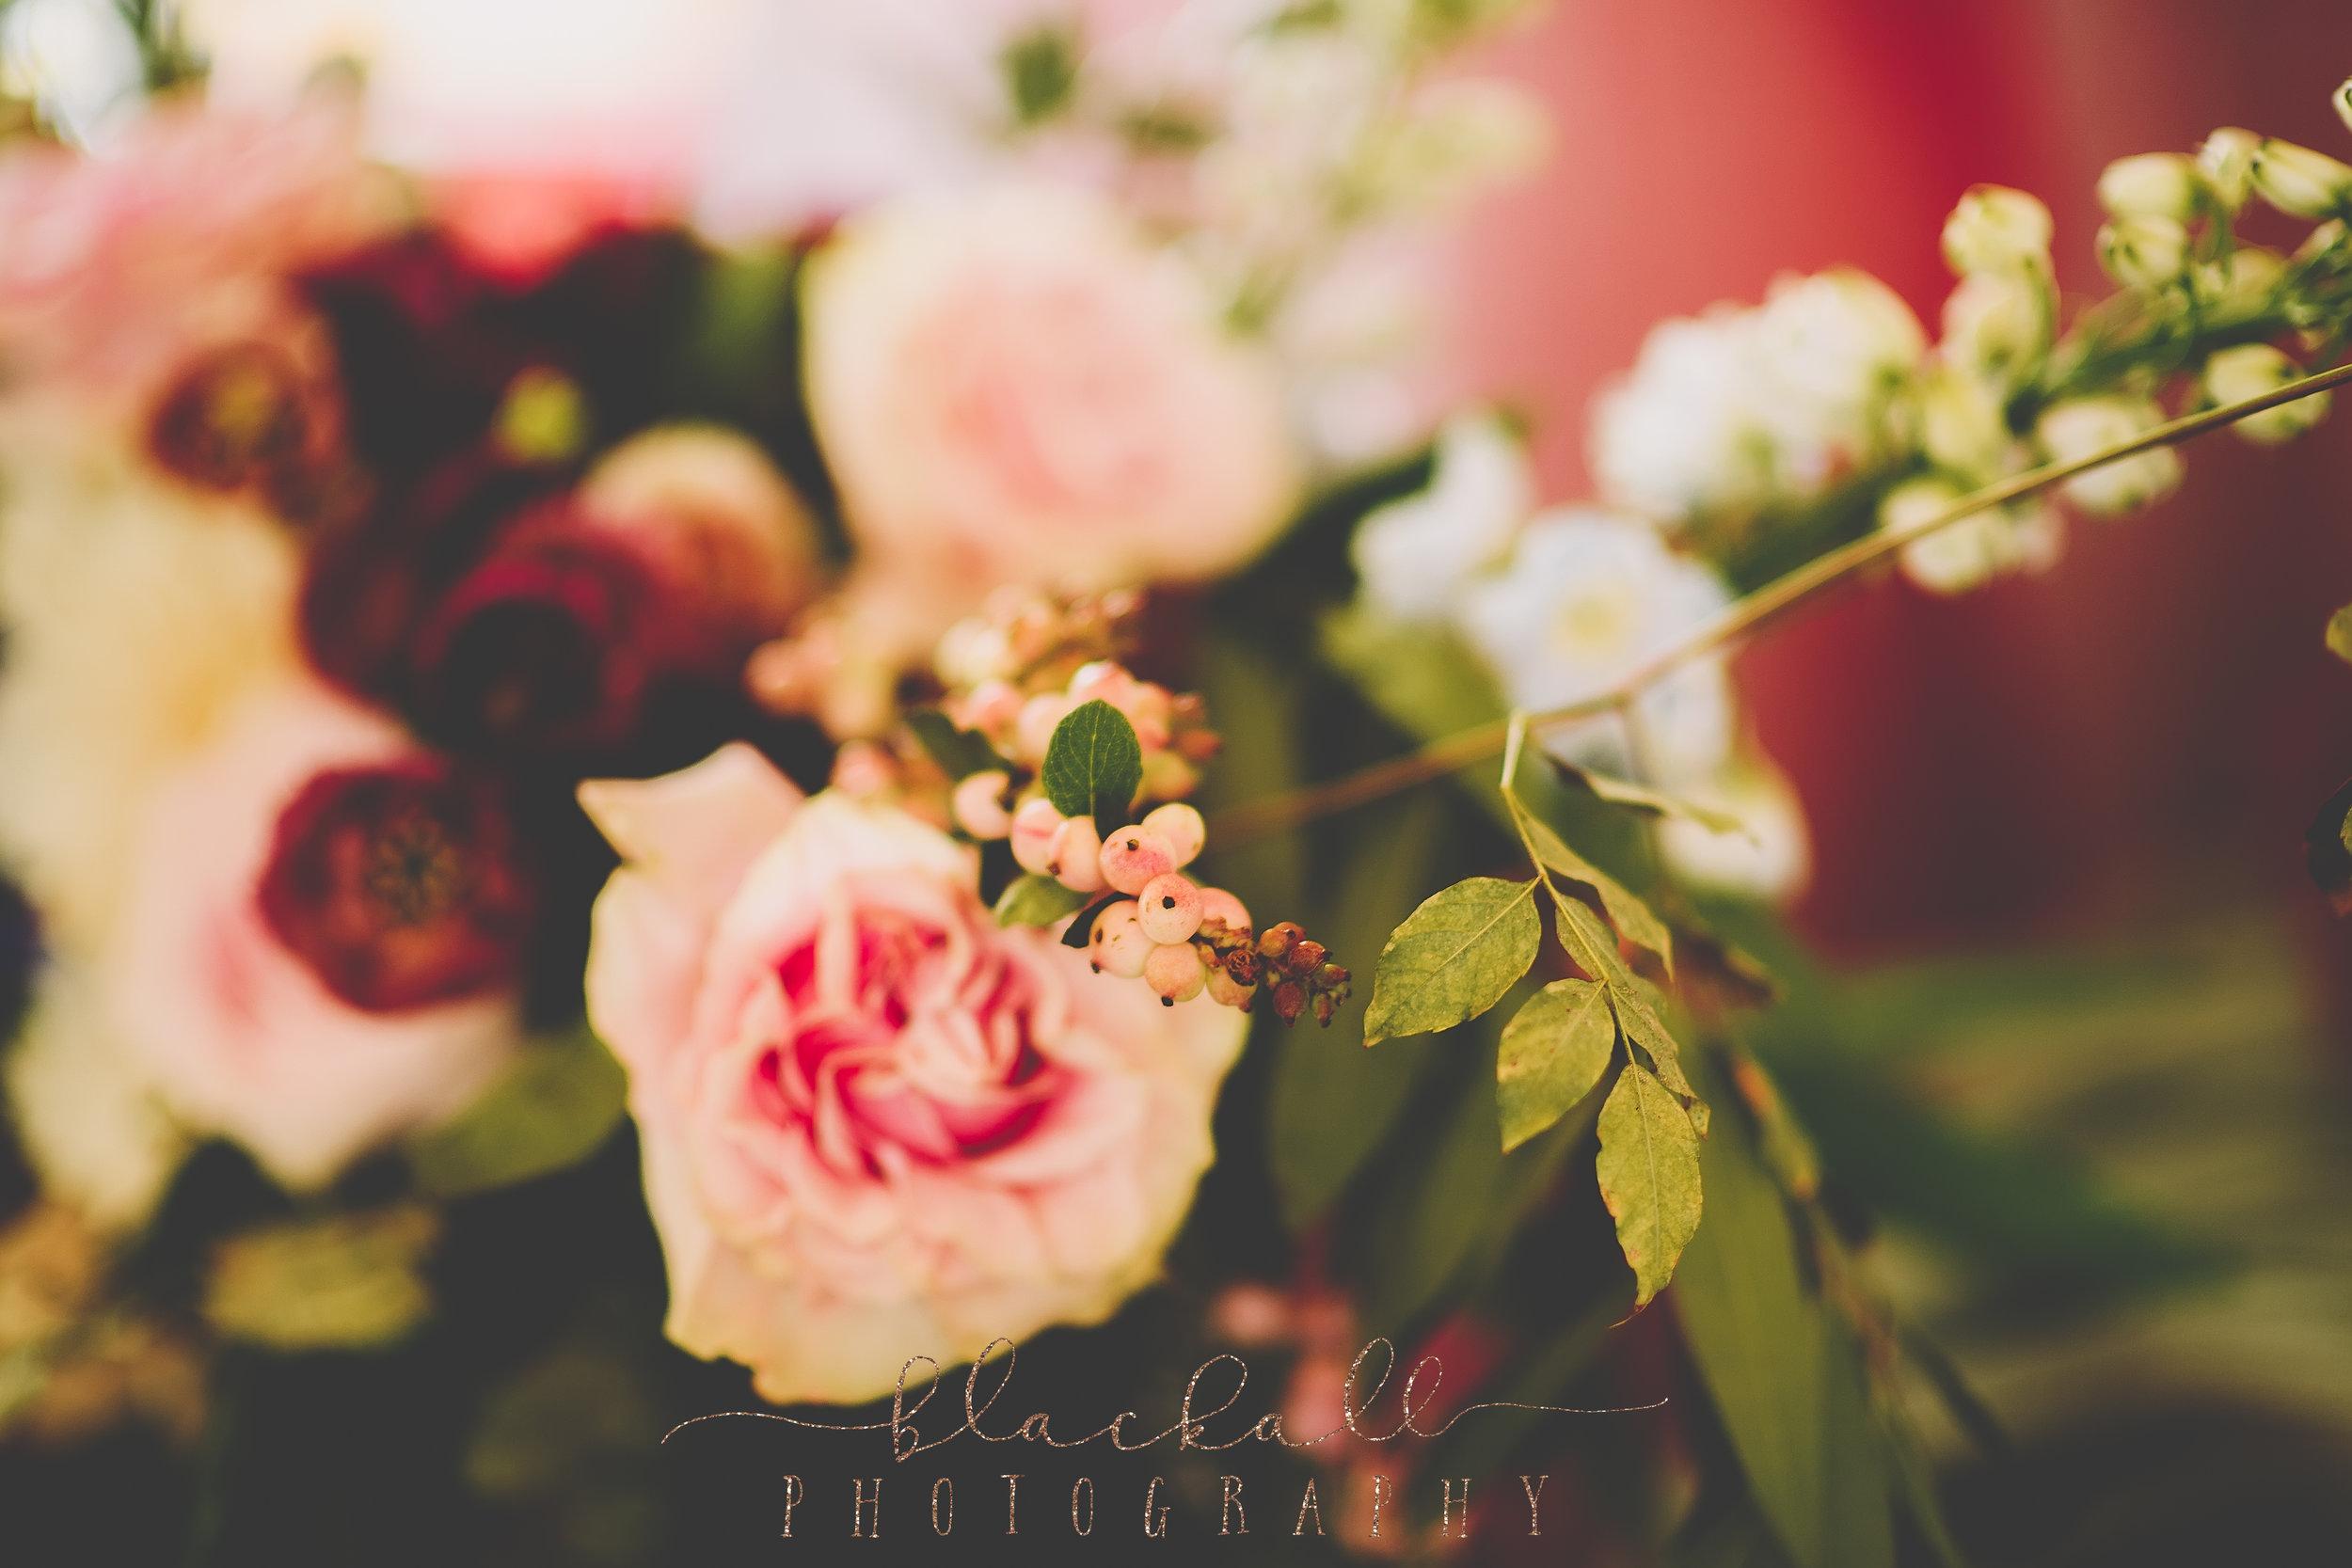 HHR_BlackallPhotography_16.JPG